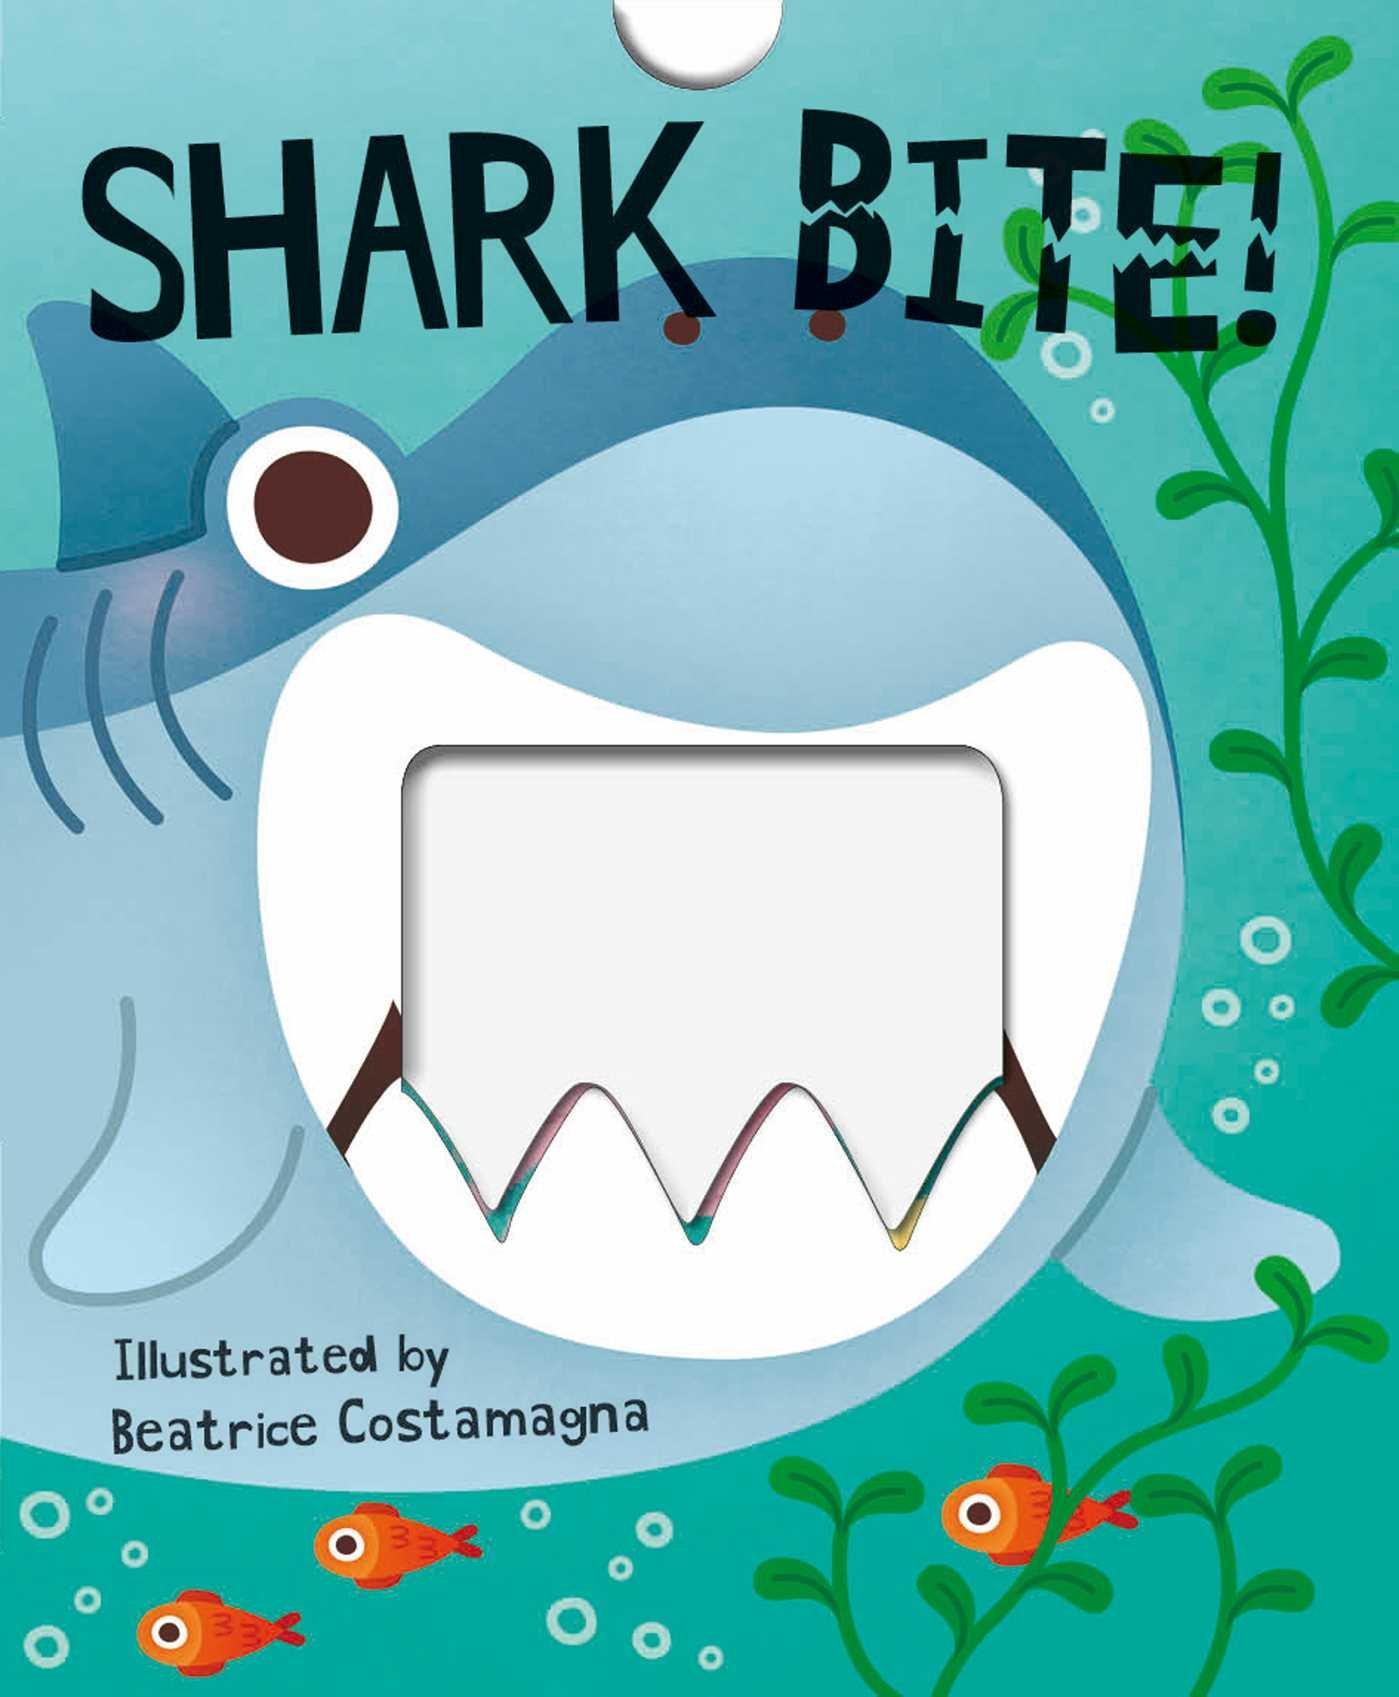 Shark Bite by Beatrice Costamgna